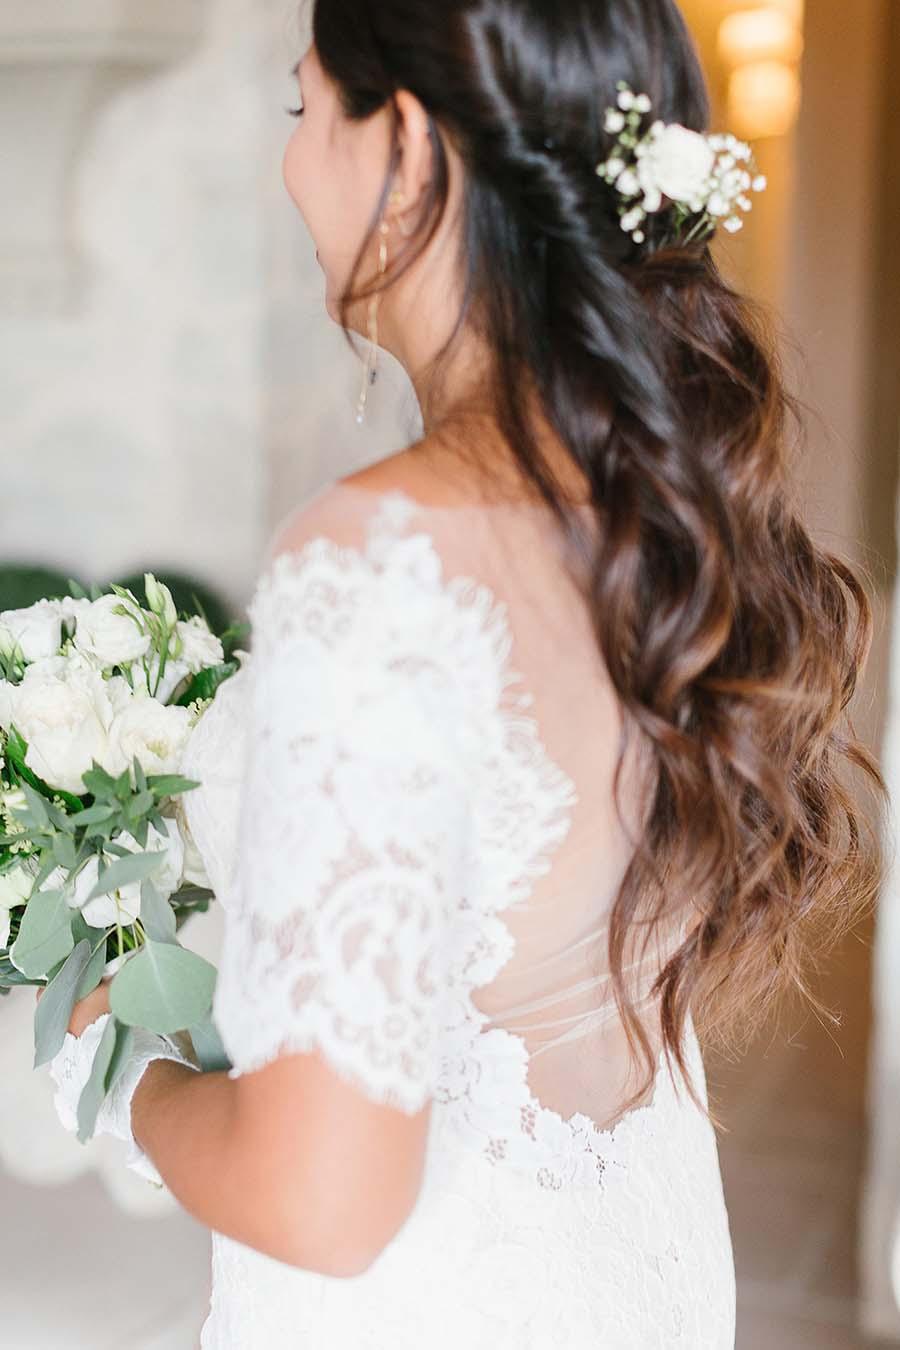 villa-le-fontanelle-wedding-photographer-ilaria-petrucci-marco-severine-227